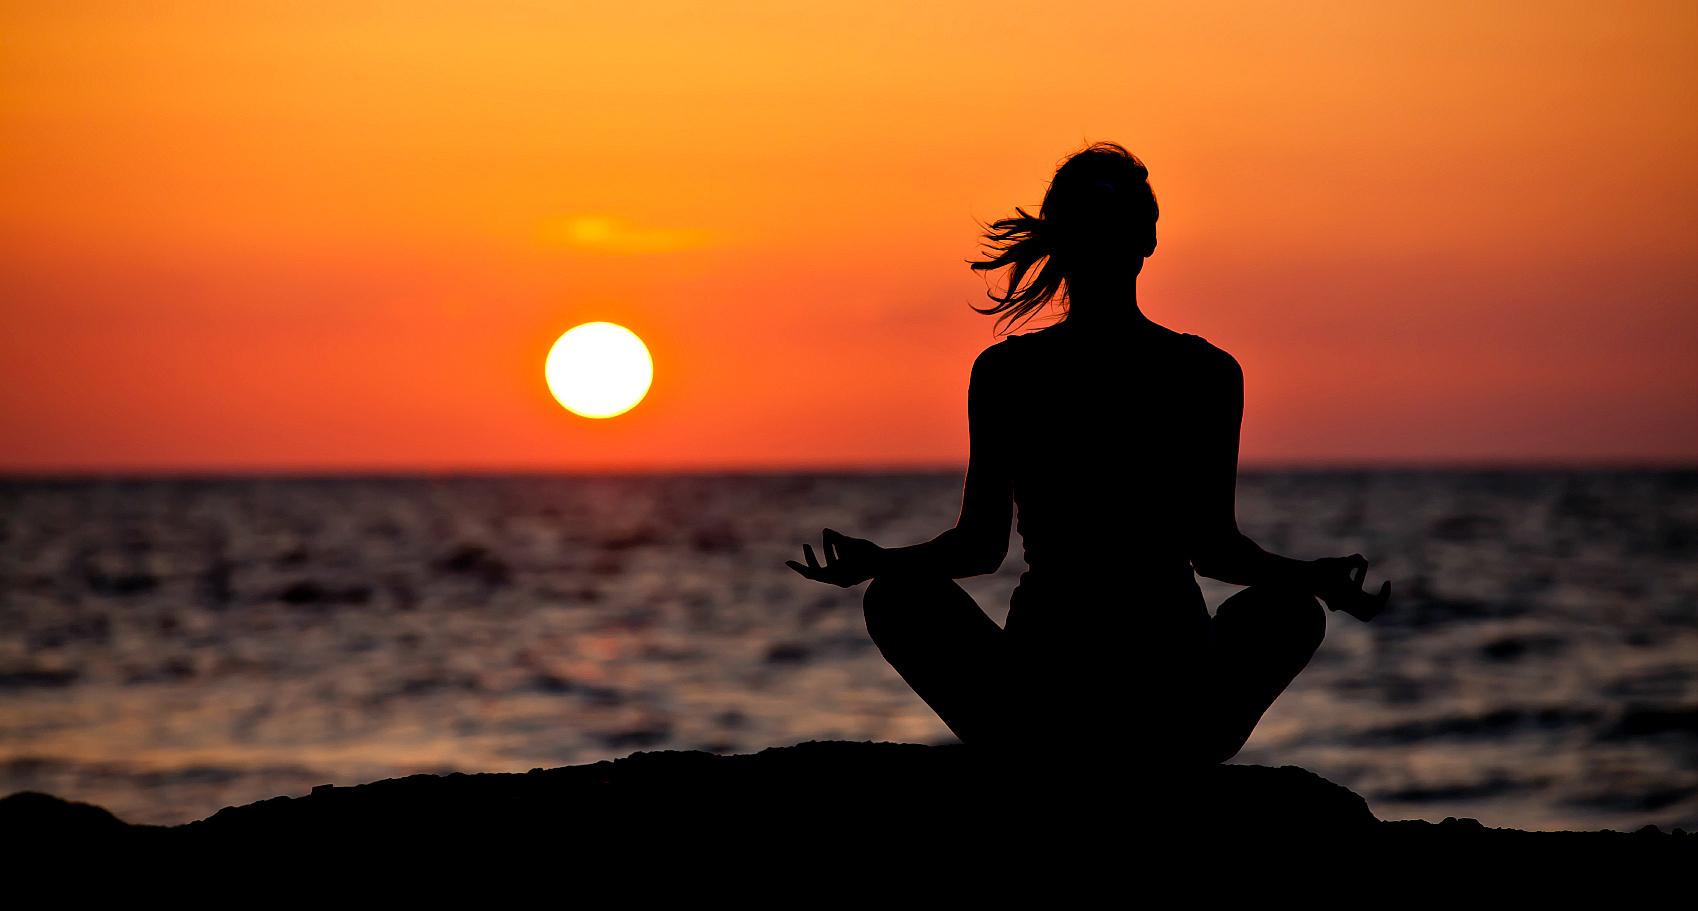 http://www.ishtadevata.com/blog/wp-content/uploads/2015/10/sun-worship.jpg